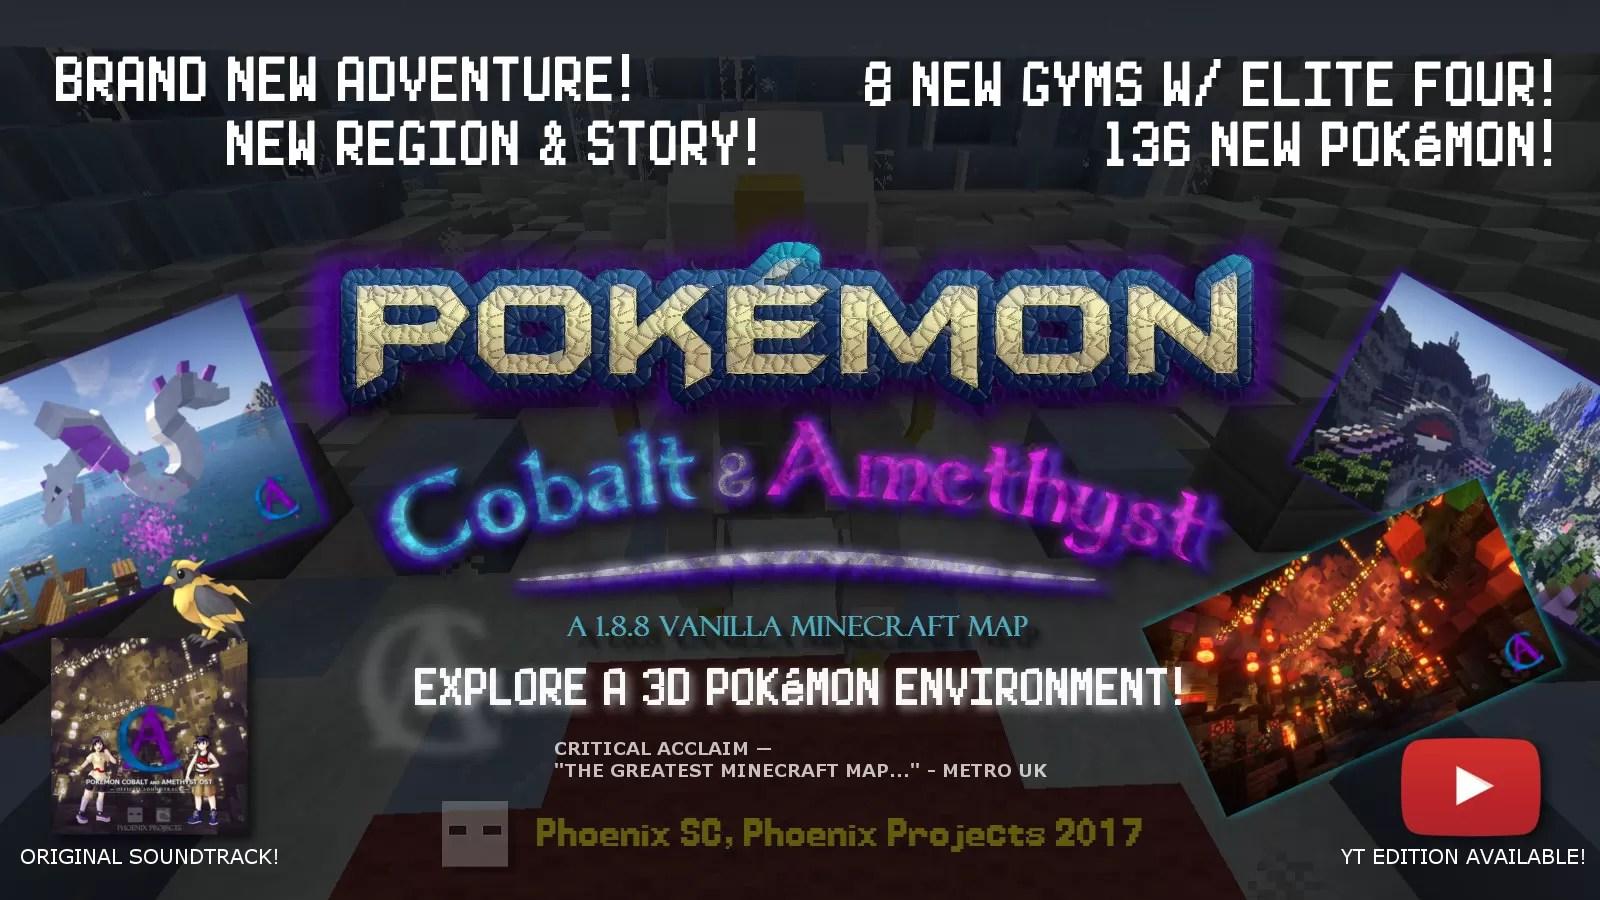 Pokémon Cobalt And Amethyst Map For Minecraft 1.8.8